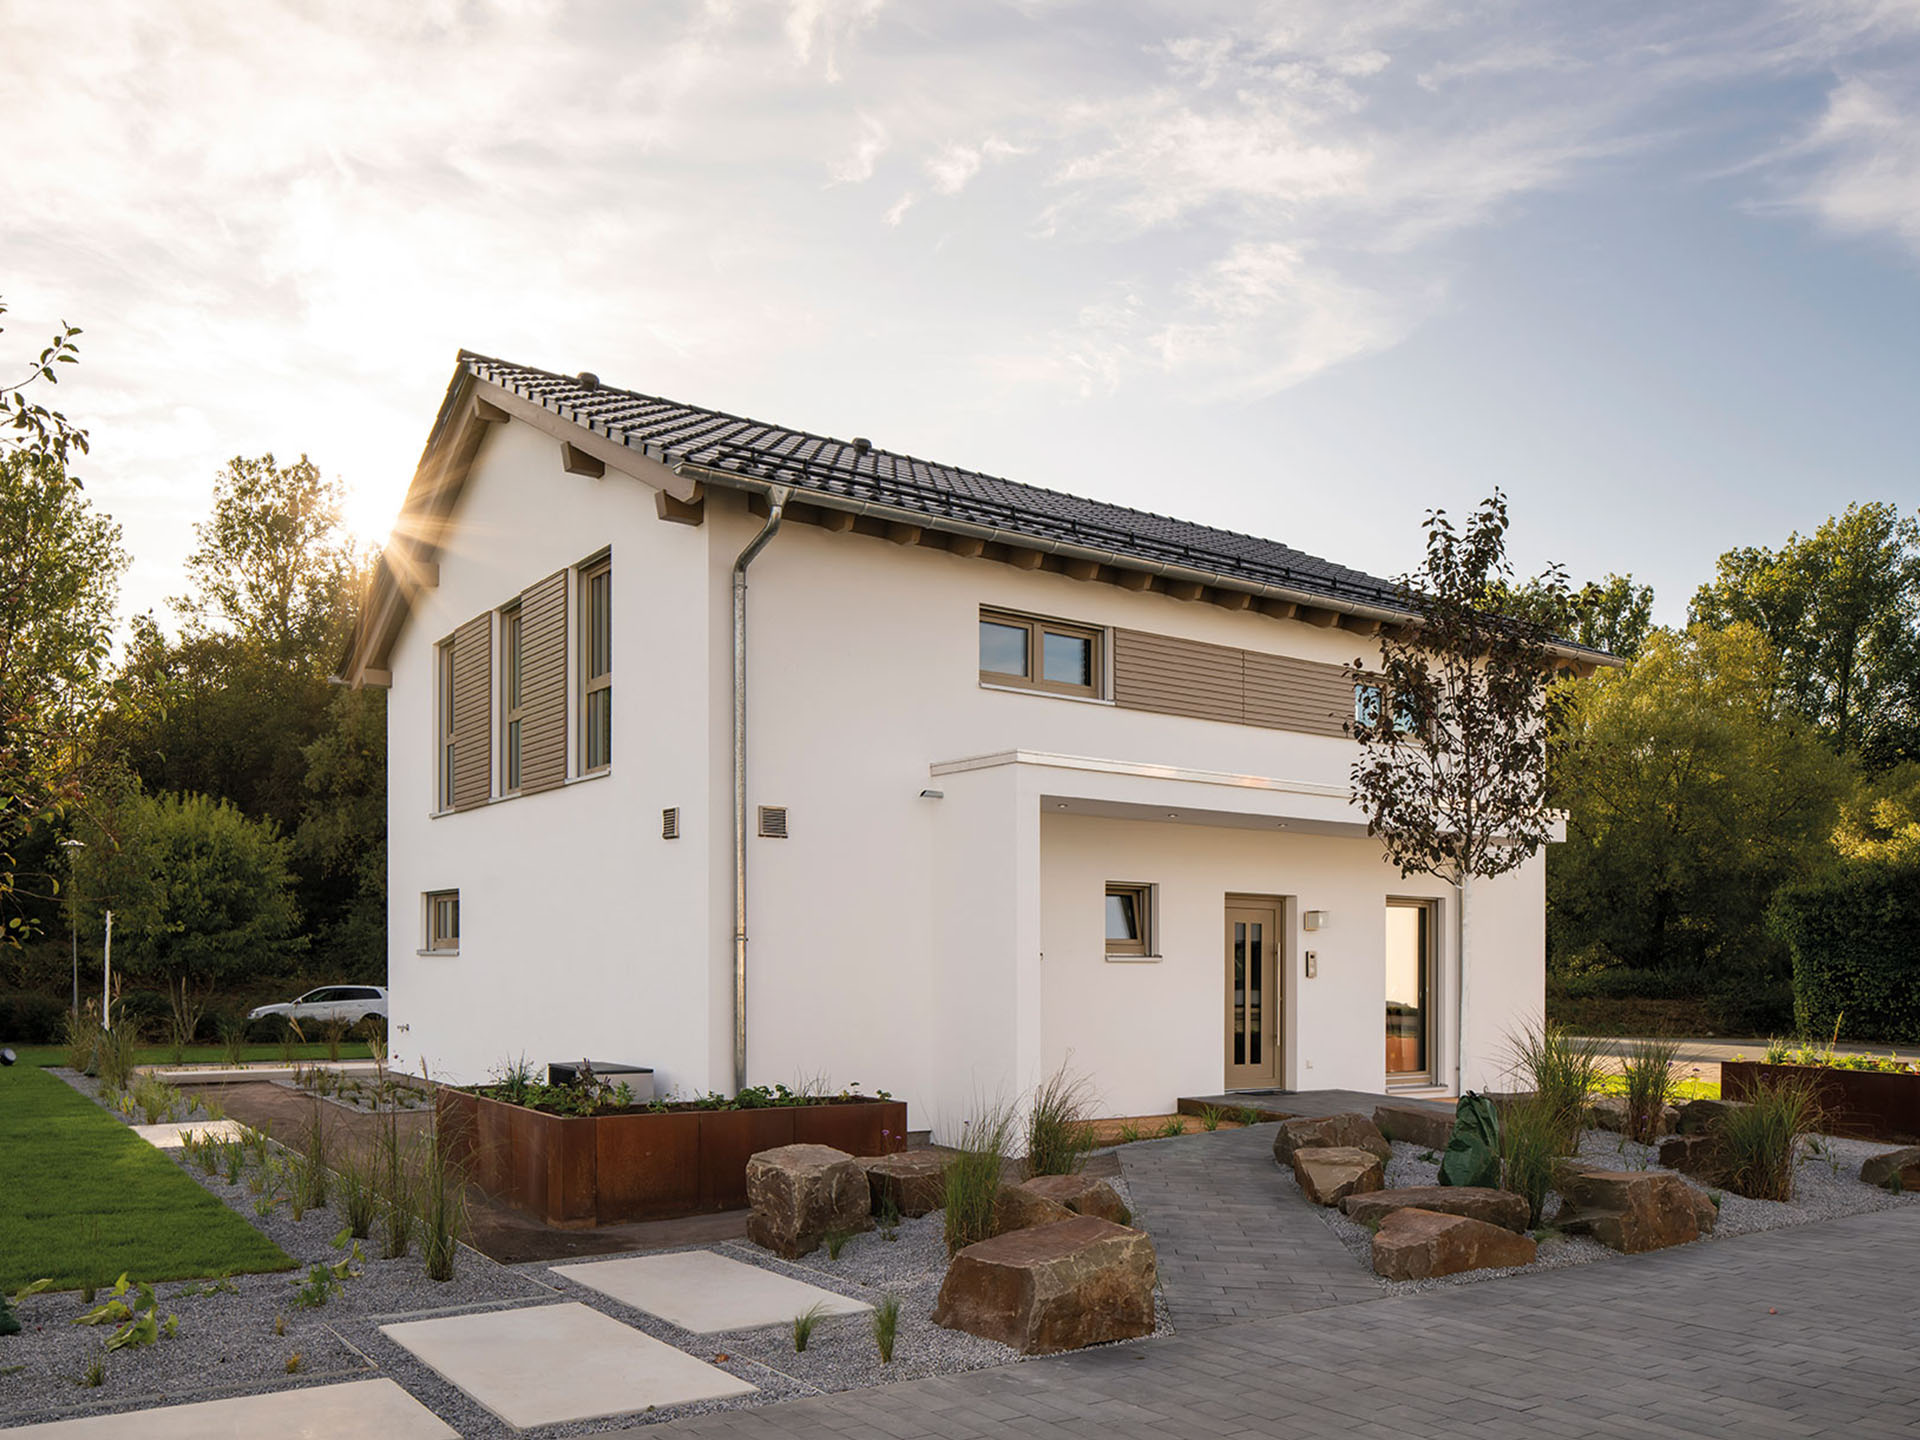 Fertighaus Musterhaus SENTO in Frankenberg